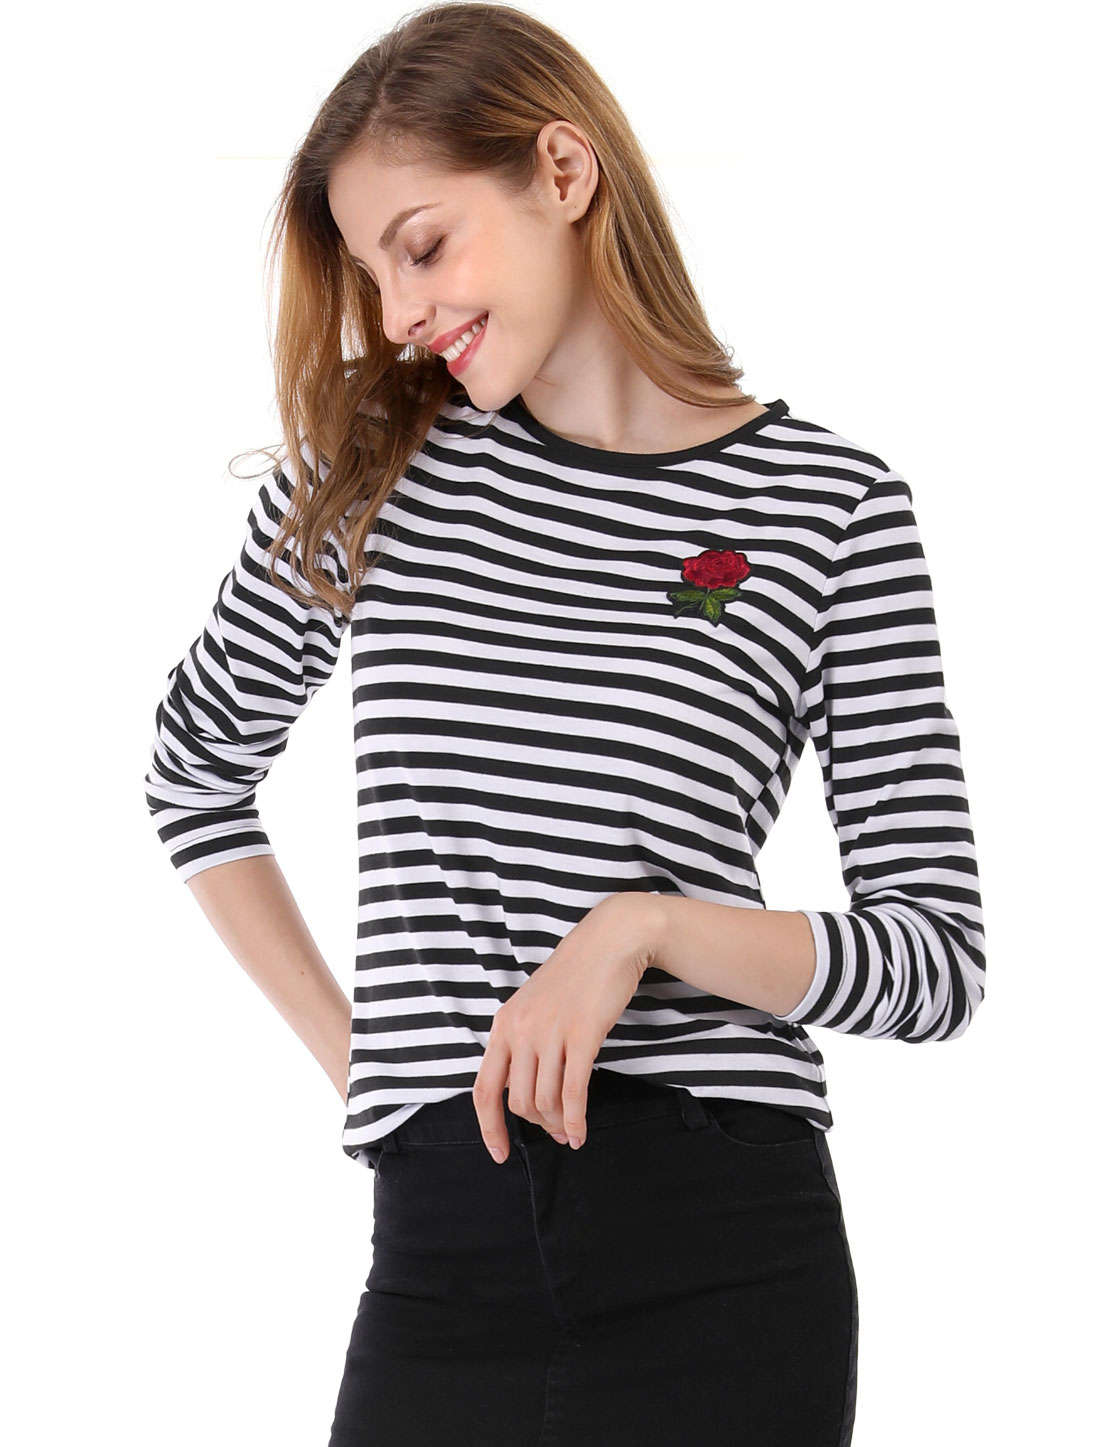 Allegra K Women Rose Patch Piped Crew Neckline Striped Top Black M